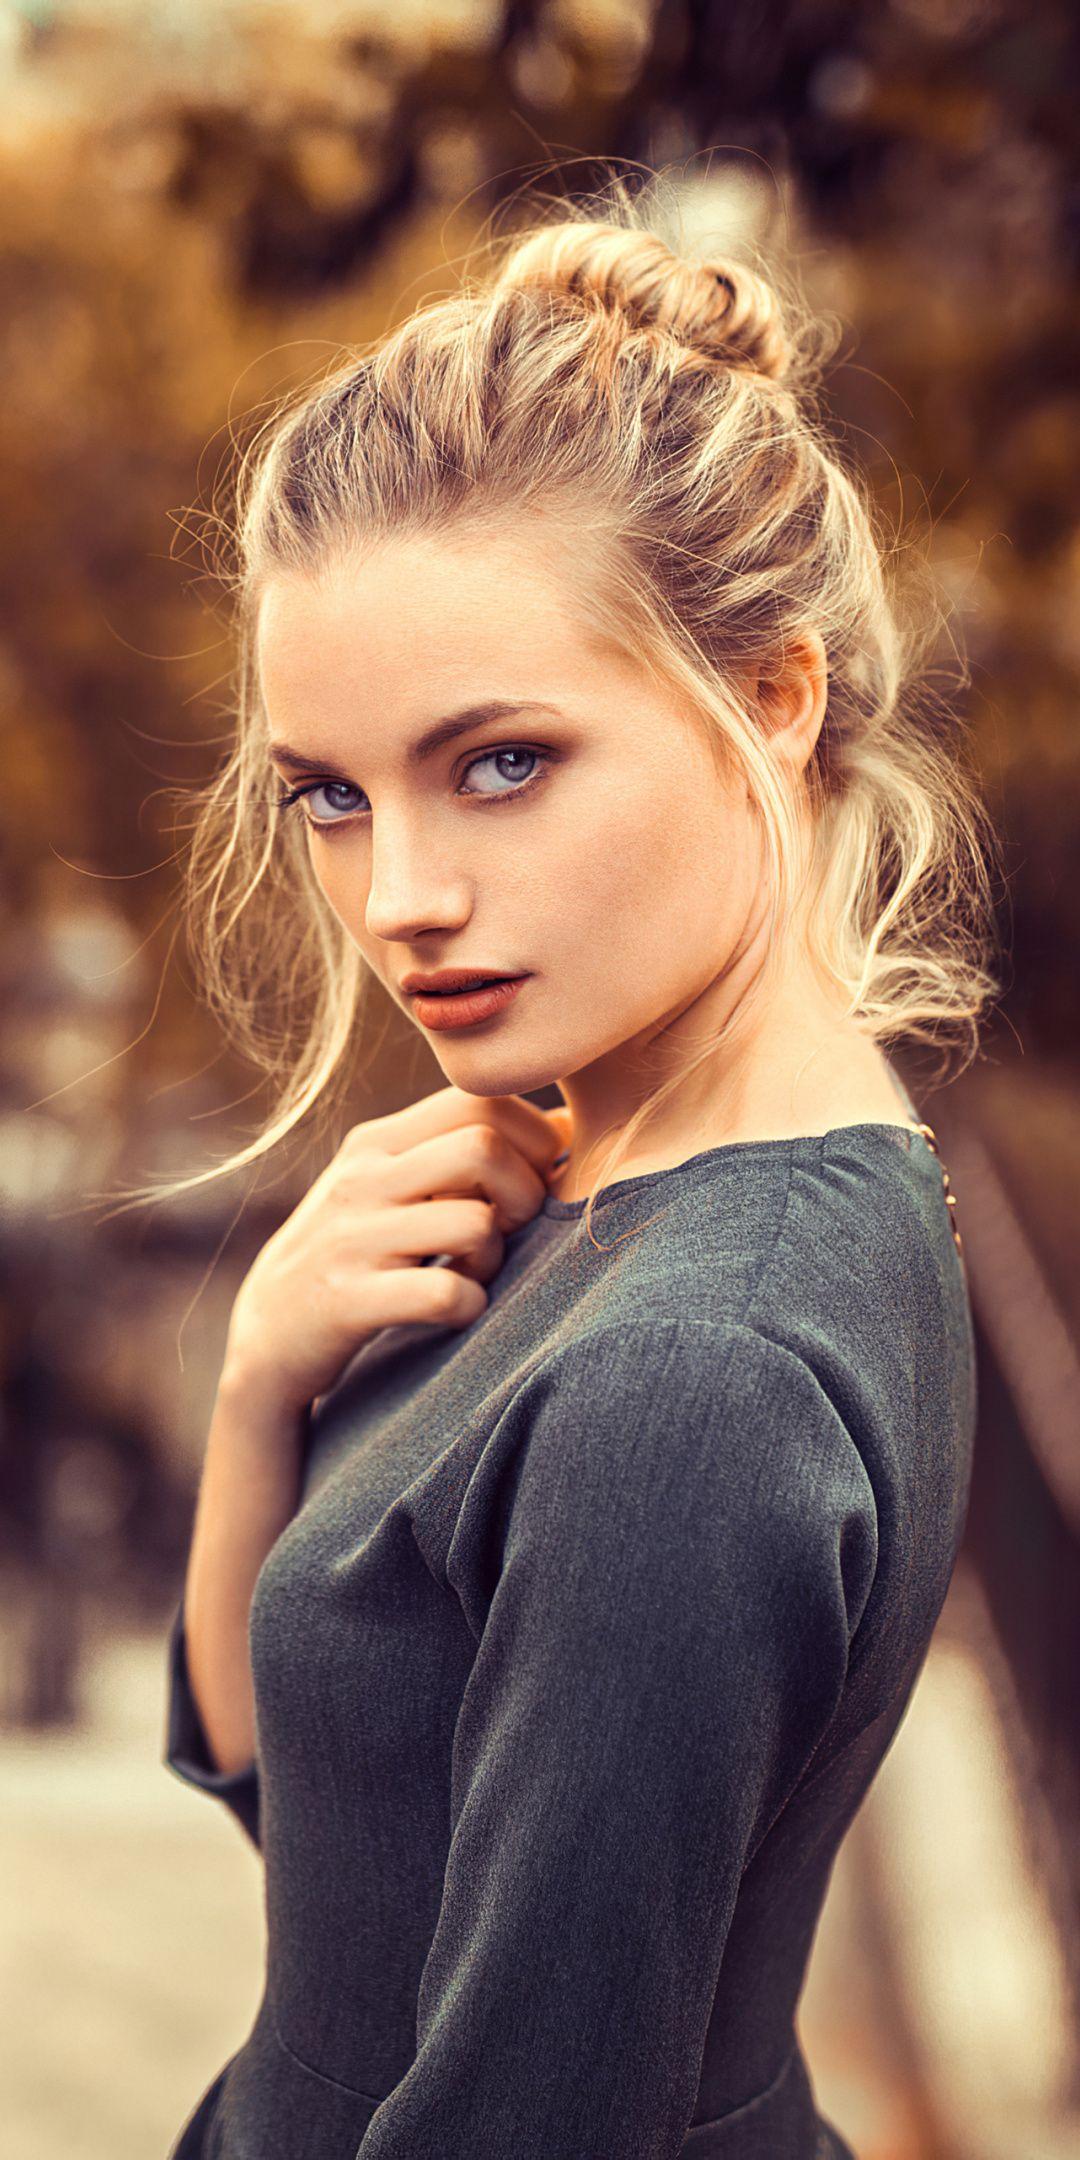 1080x2160 Blonde and beautiful woman portrait wallpaper 1080x2160